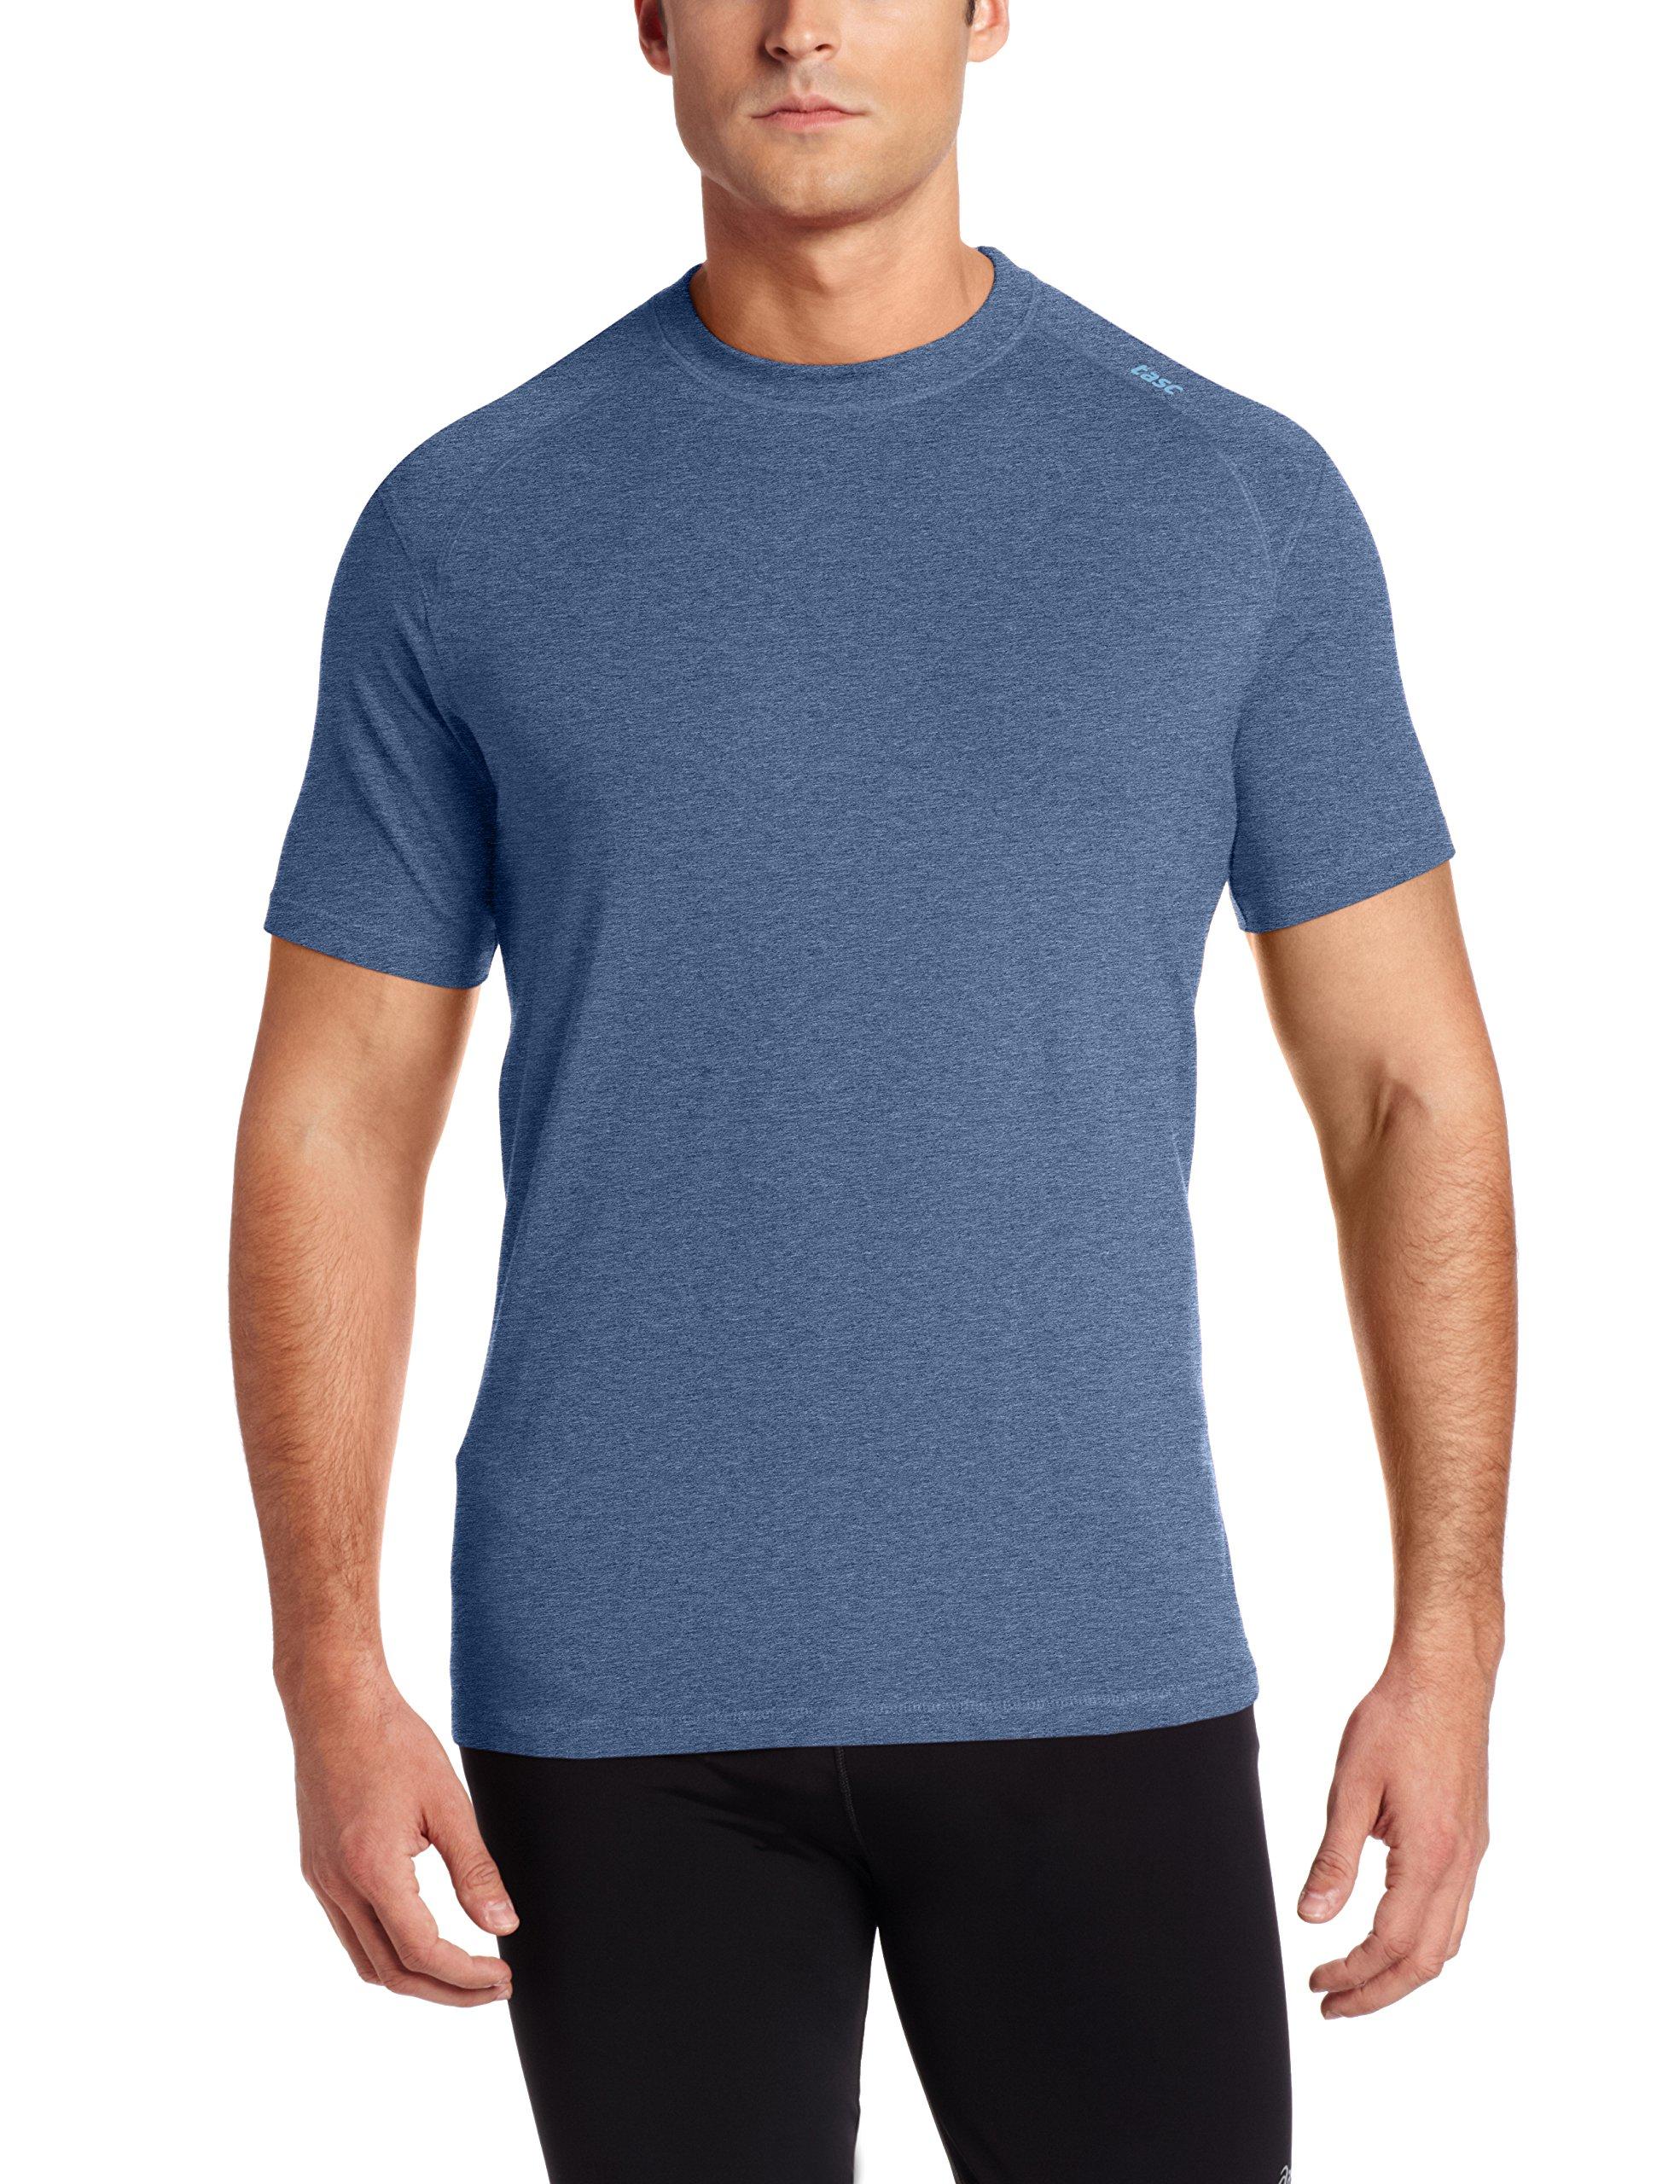 tasc Performance Carrollton T-Shirt, Indigo Heather, XX-Large by tasc Performance